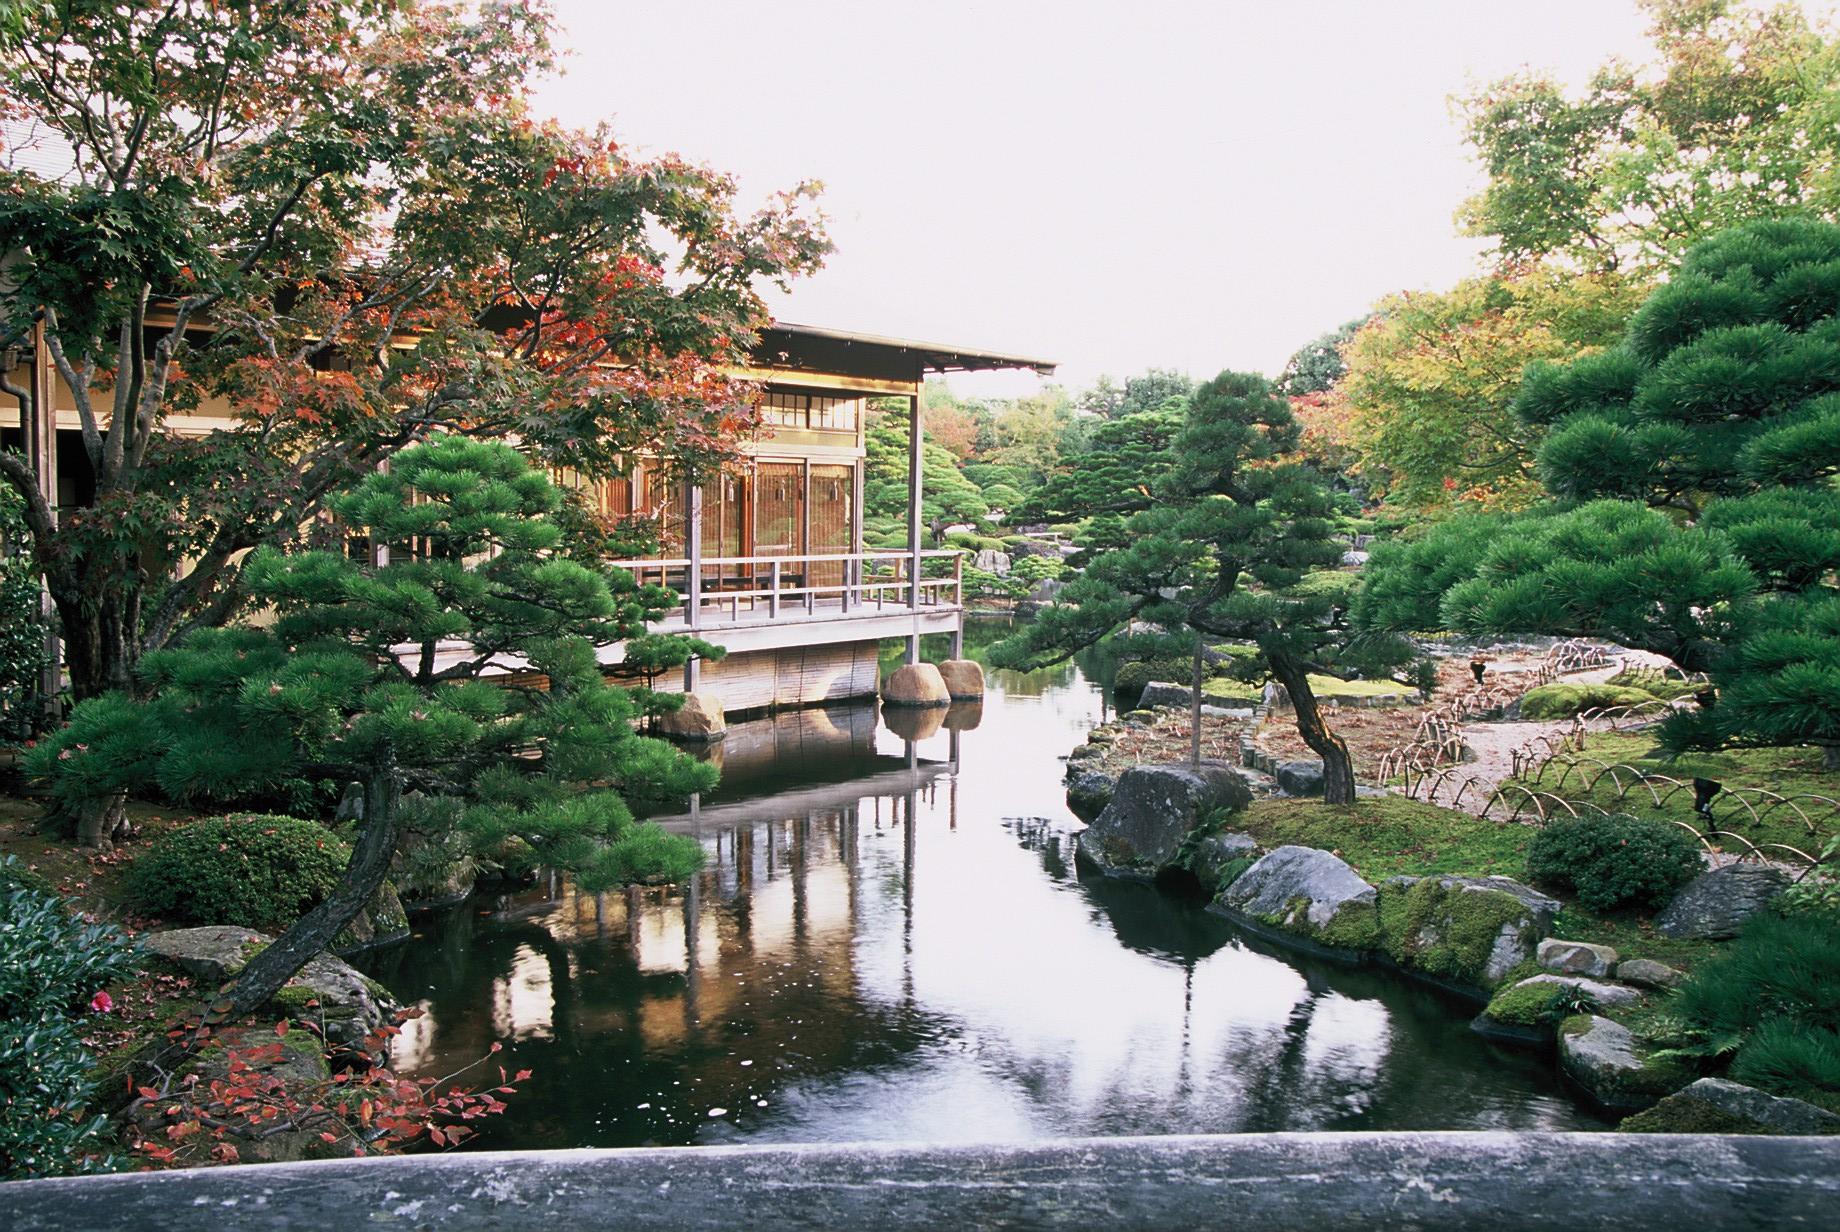 Jardin japonais kanazawa matue et okayama votre voyage for Jardines okayama